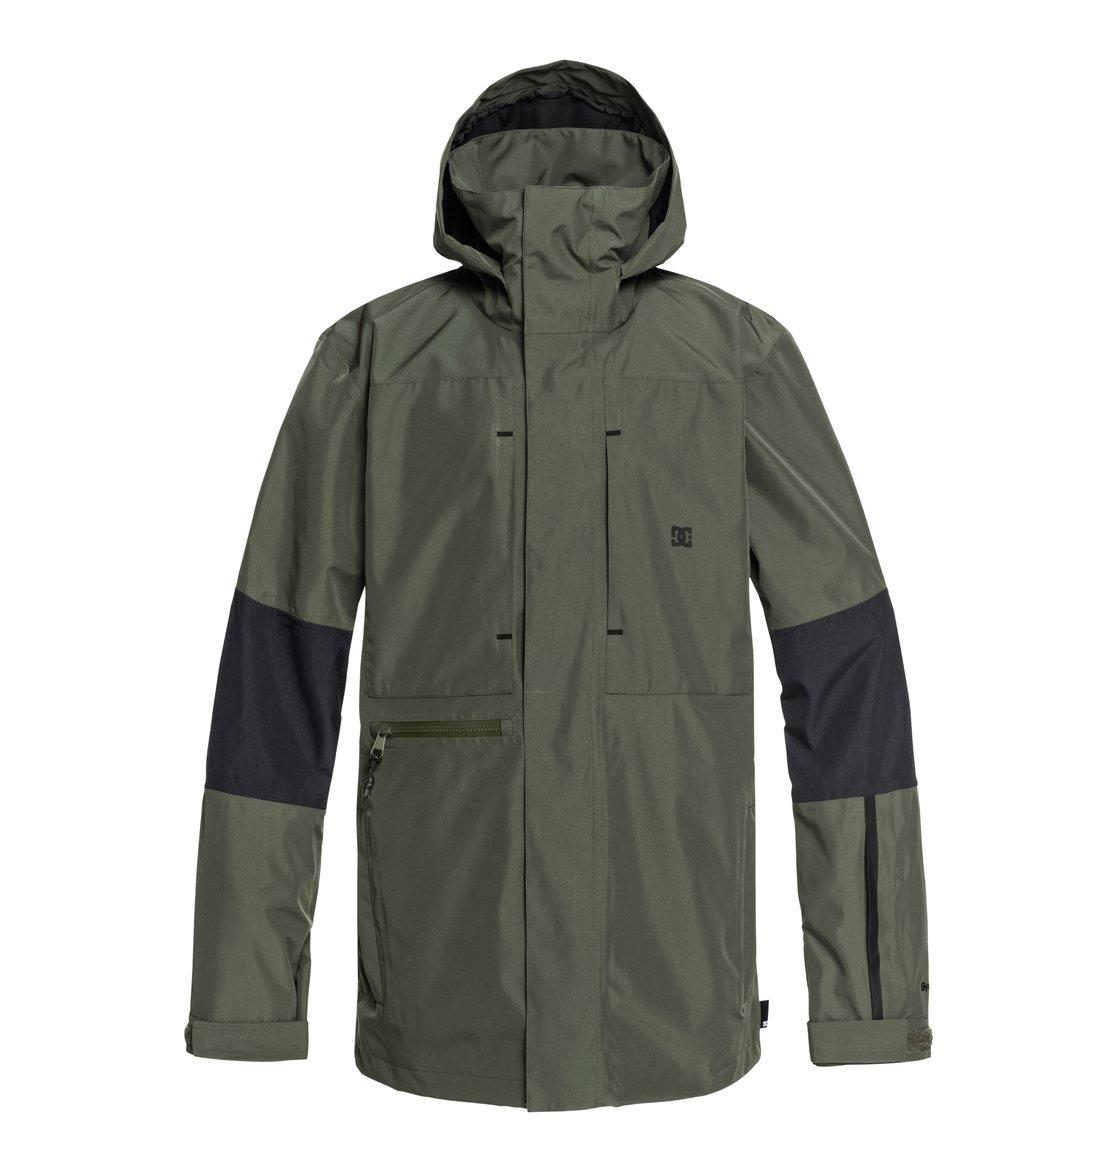 cca5f8767f9 0 Command - Chaqueta shell para nieve comprimible para Hombre Verde  EDYTJ03077 DC Shoes